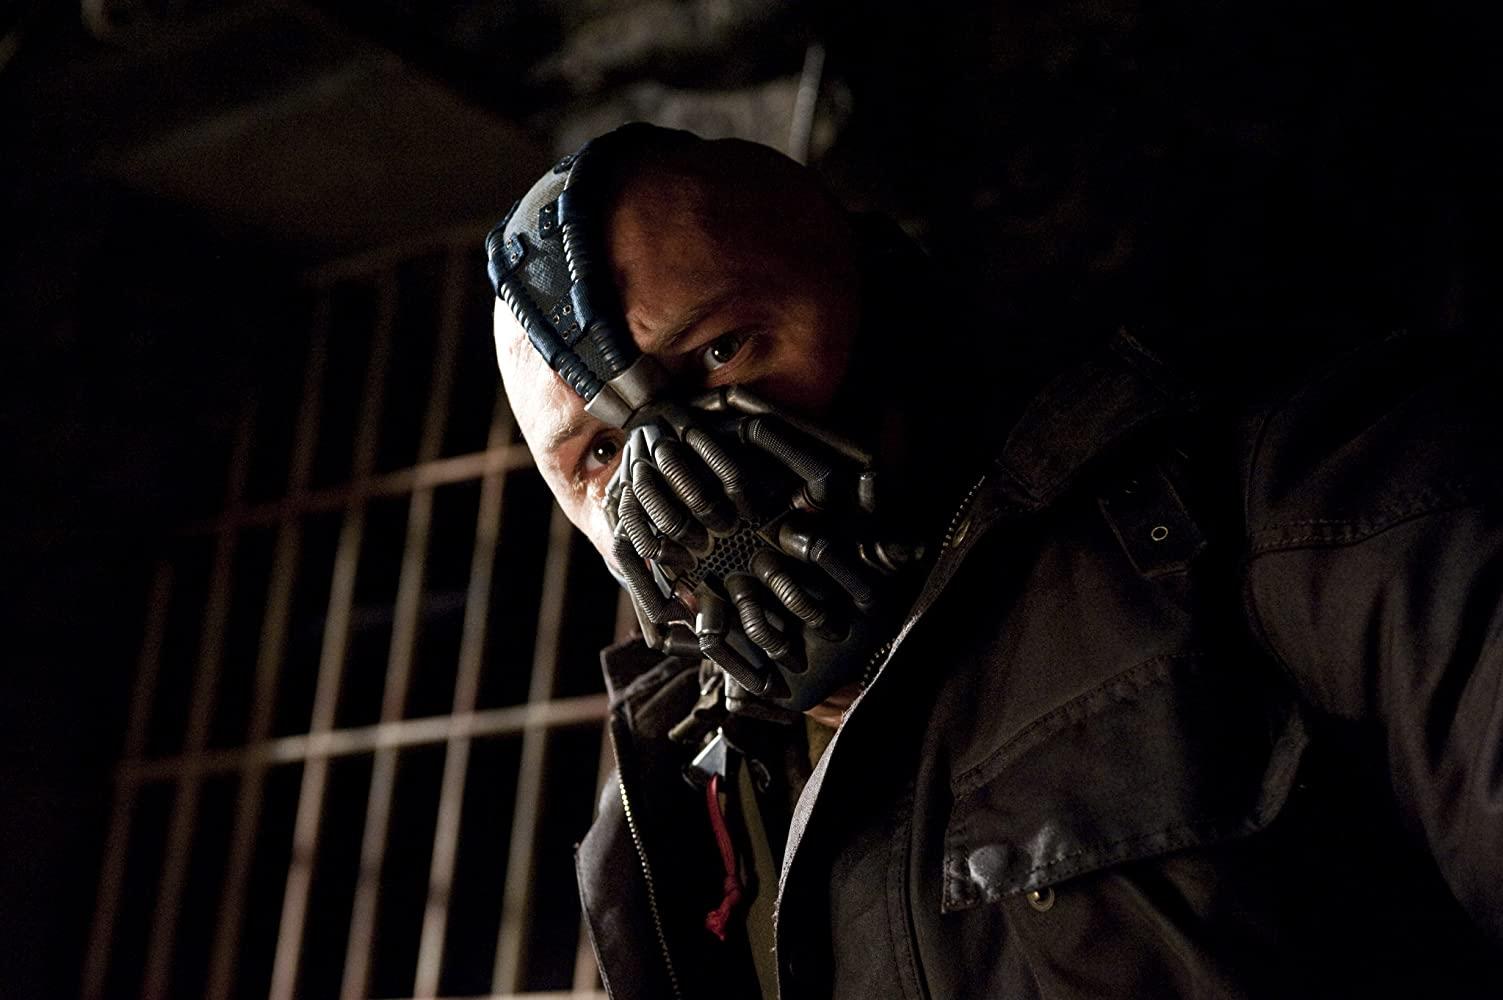 The Dark Knight Rises socially conscious Batman billionaire Bruce Wayne Christopher Nolan